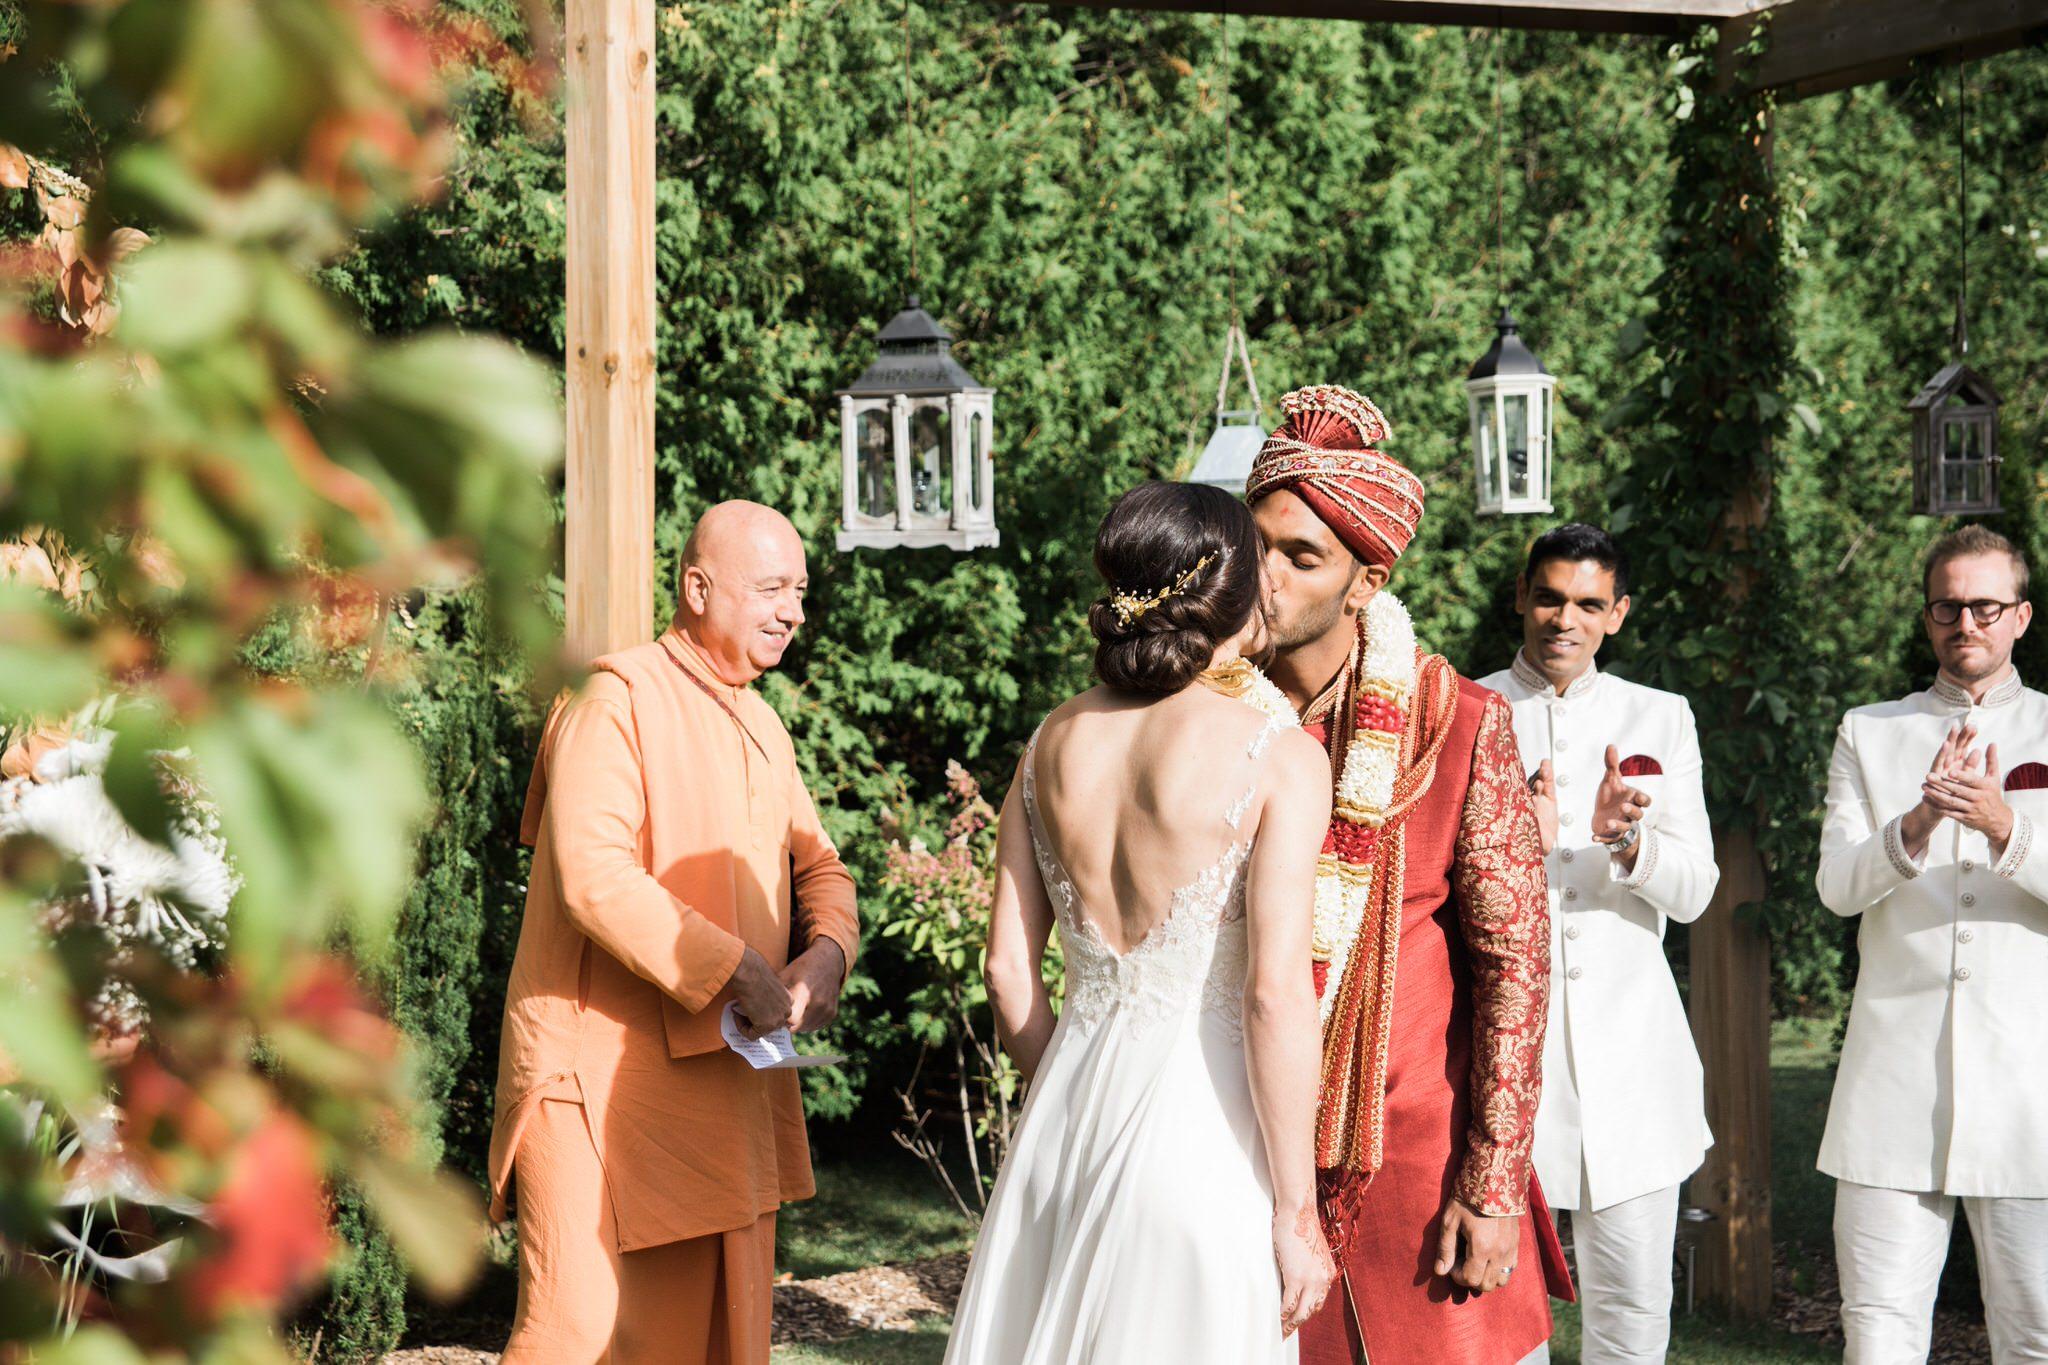 Northview Gardens Wedding - first kiss